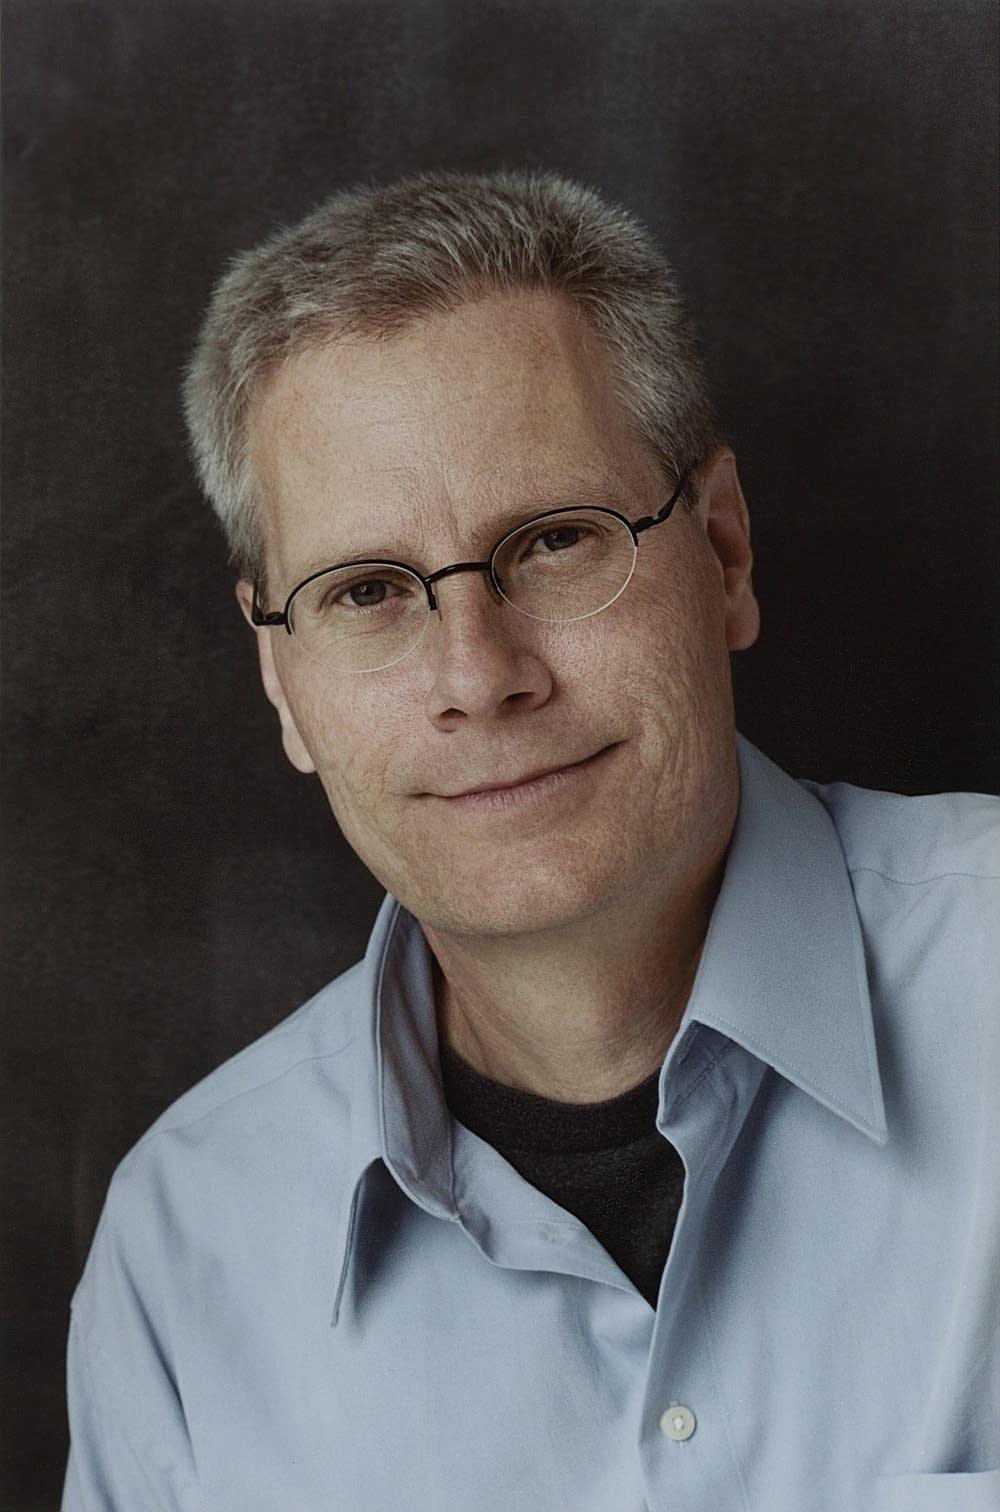 Author Lin Enger